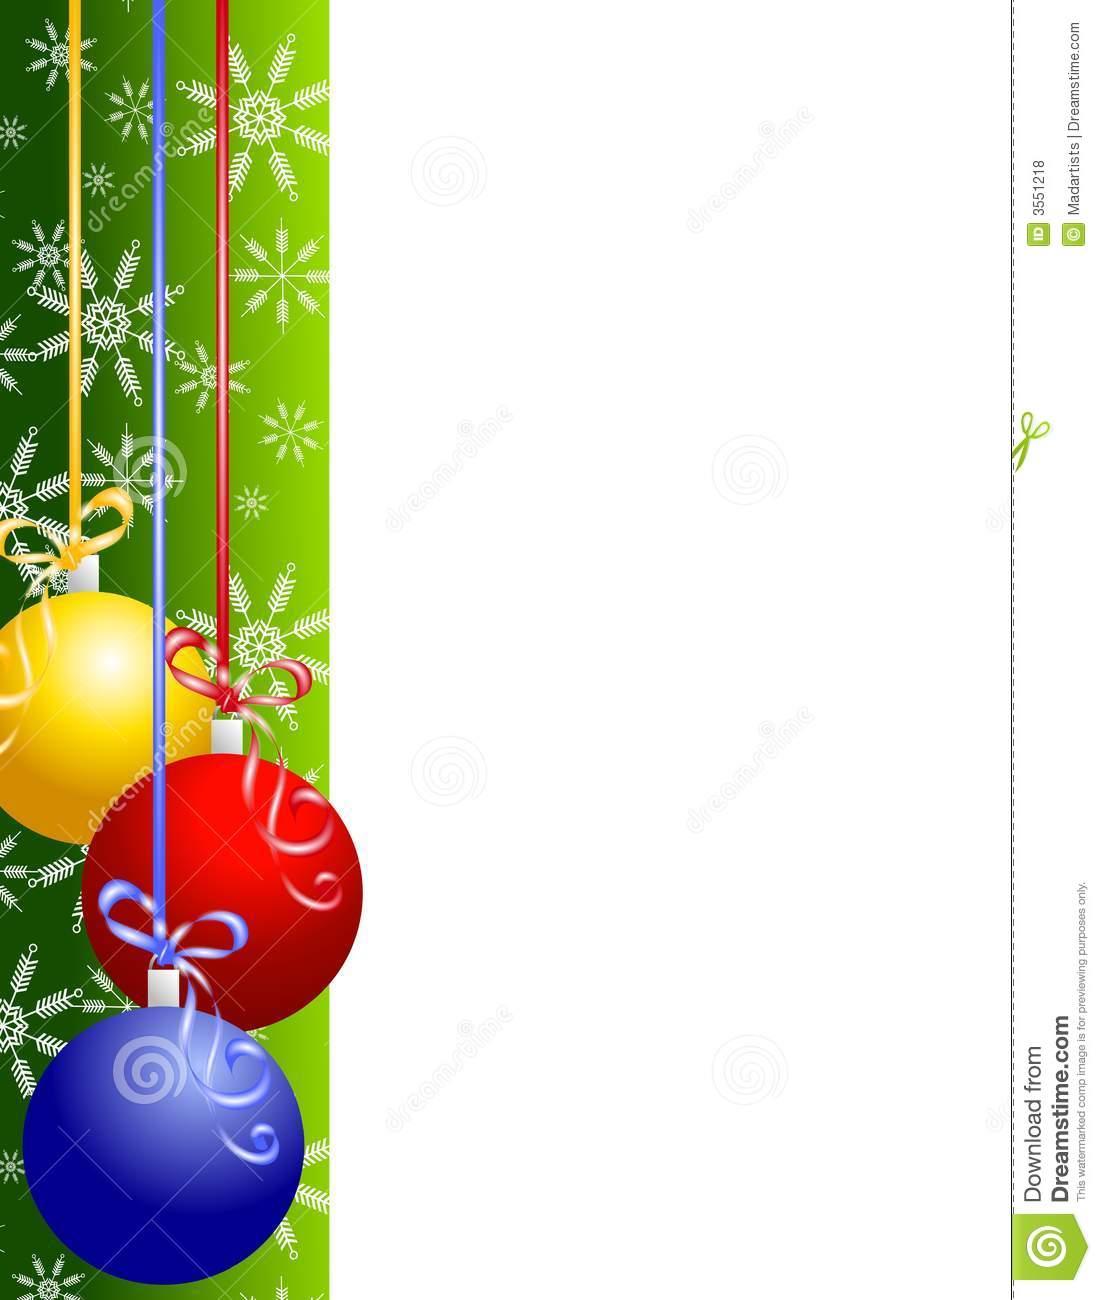 christmas clipart borders - Free Christmas Borders Clipart